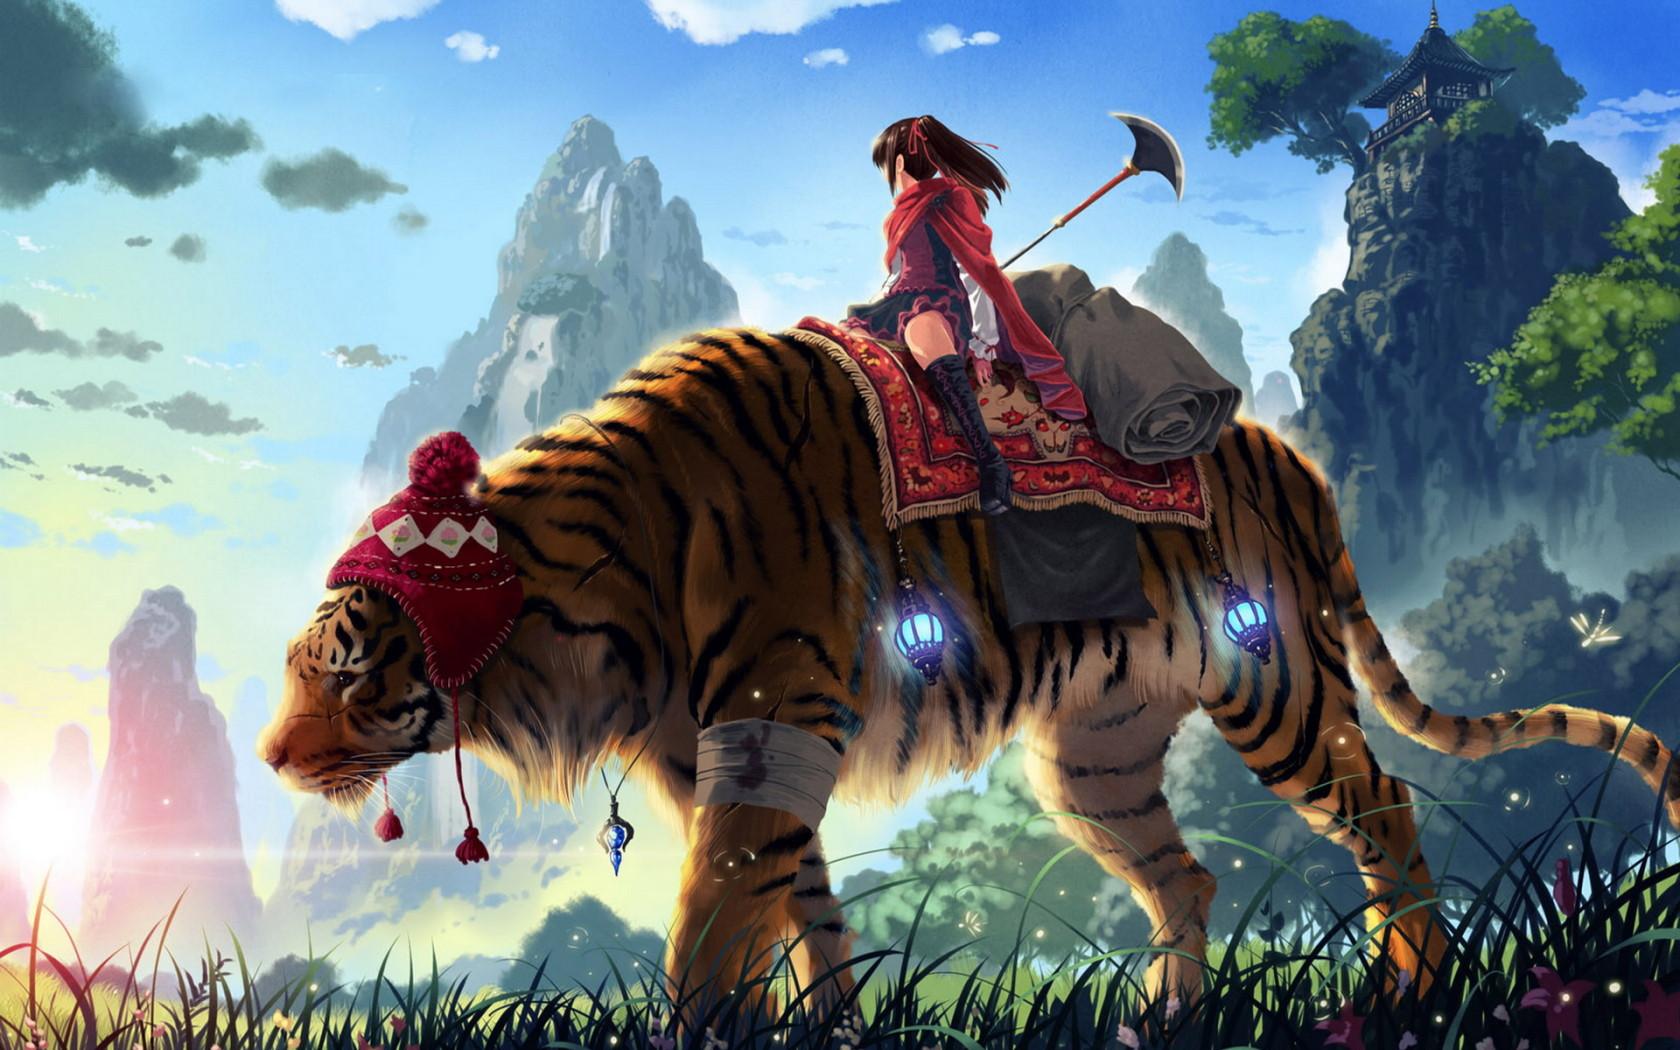 http://www.zastavki.com/pictures/1680x1050/2010/Anime_Travel_on_a_tiger_021498_.jpg